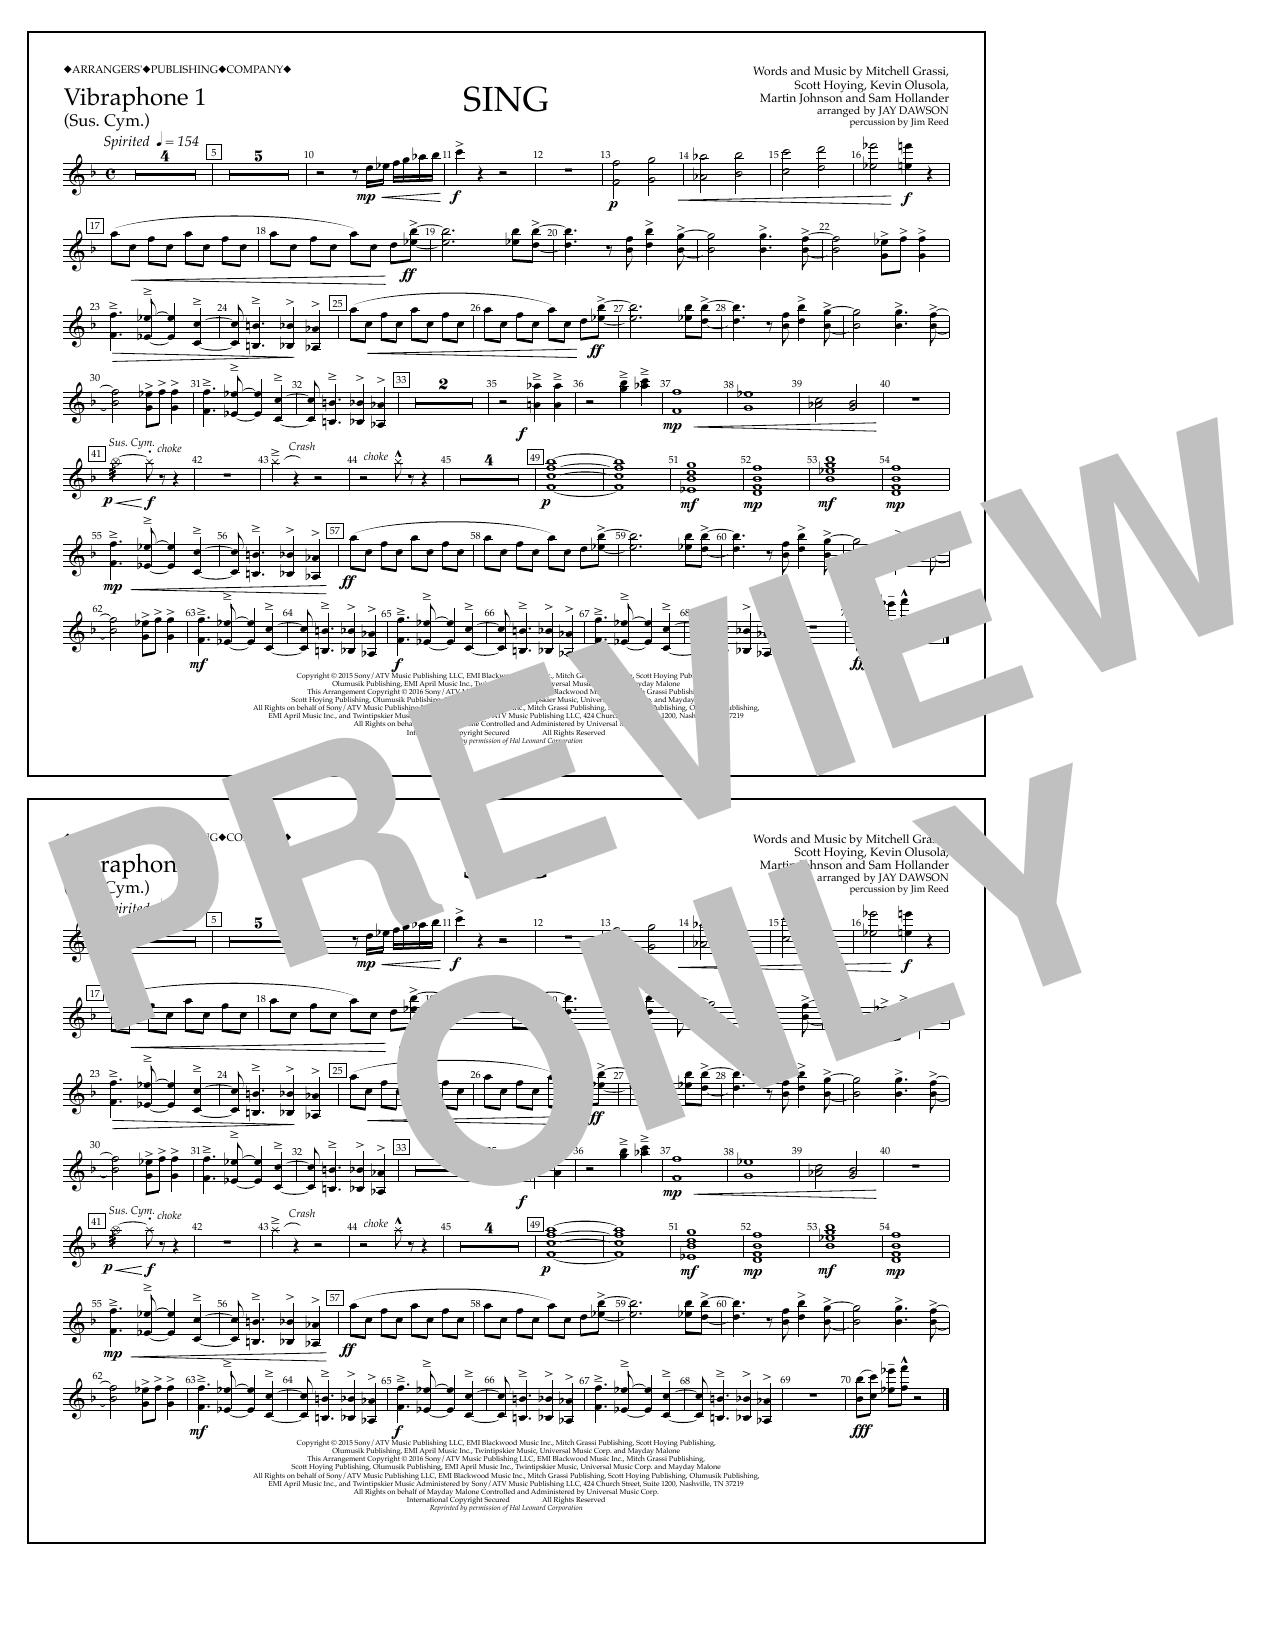 Pentatonix - Sing - Vibraphone 1